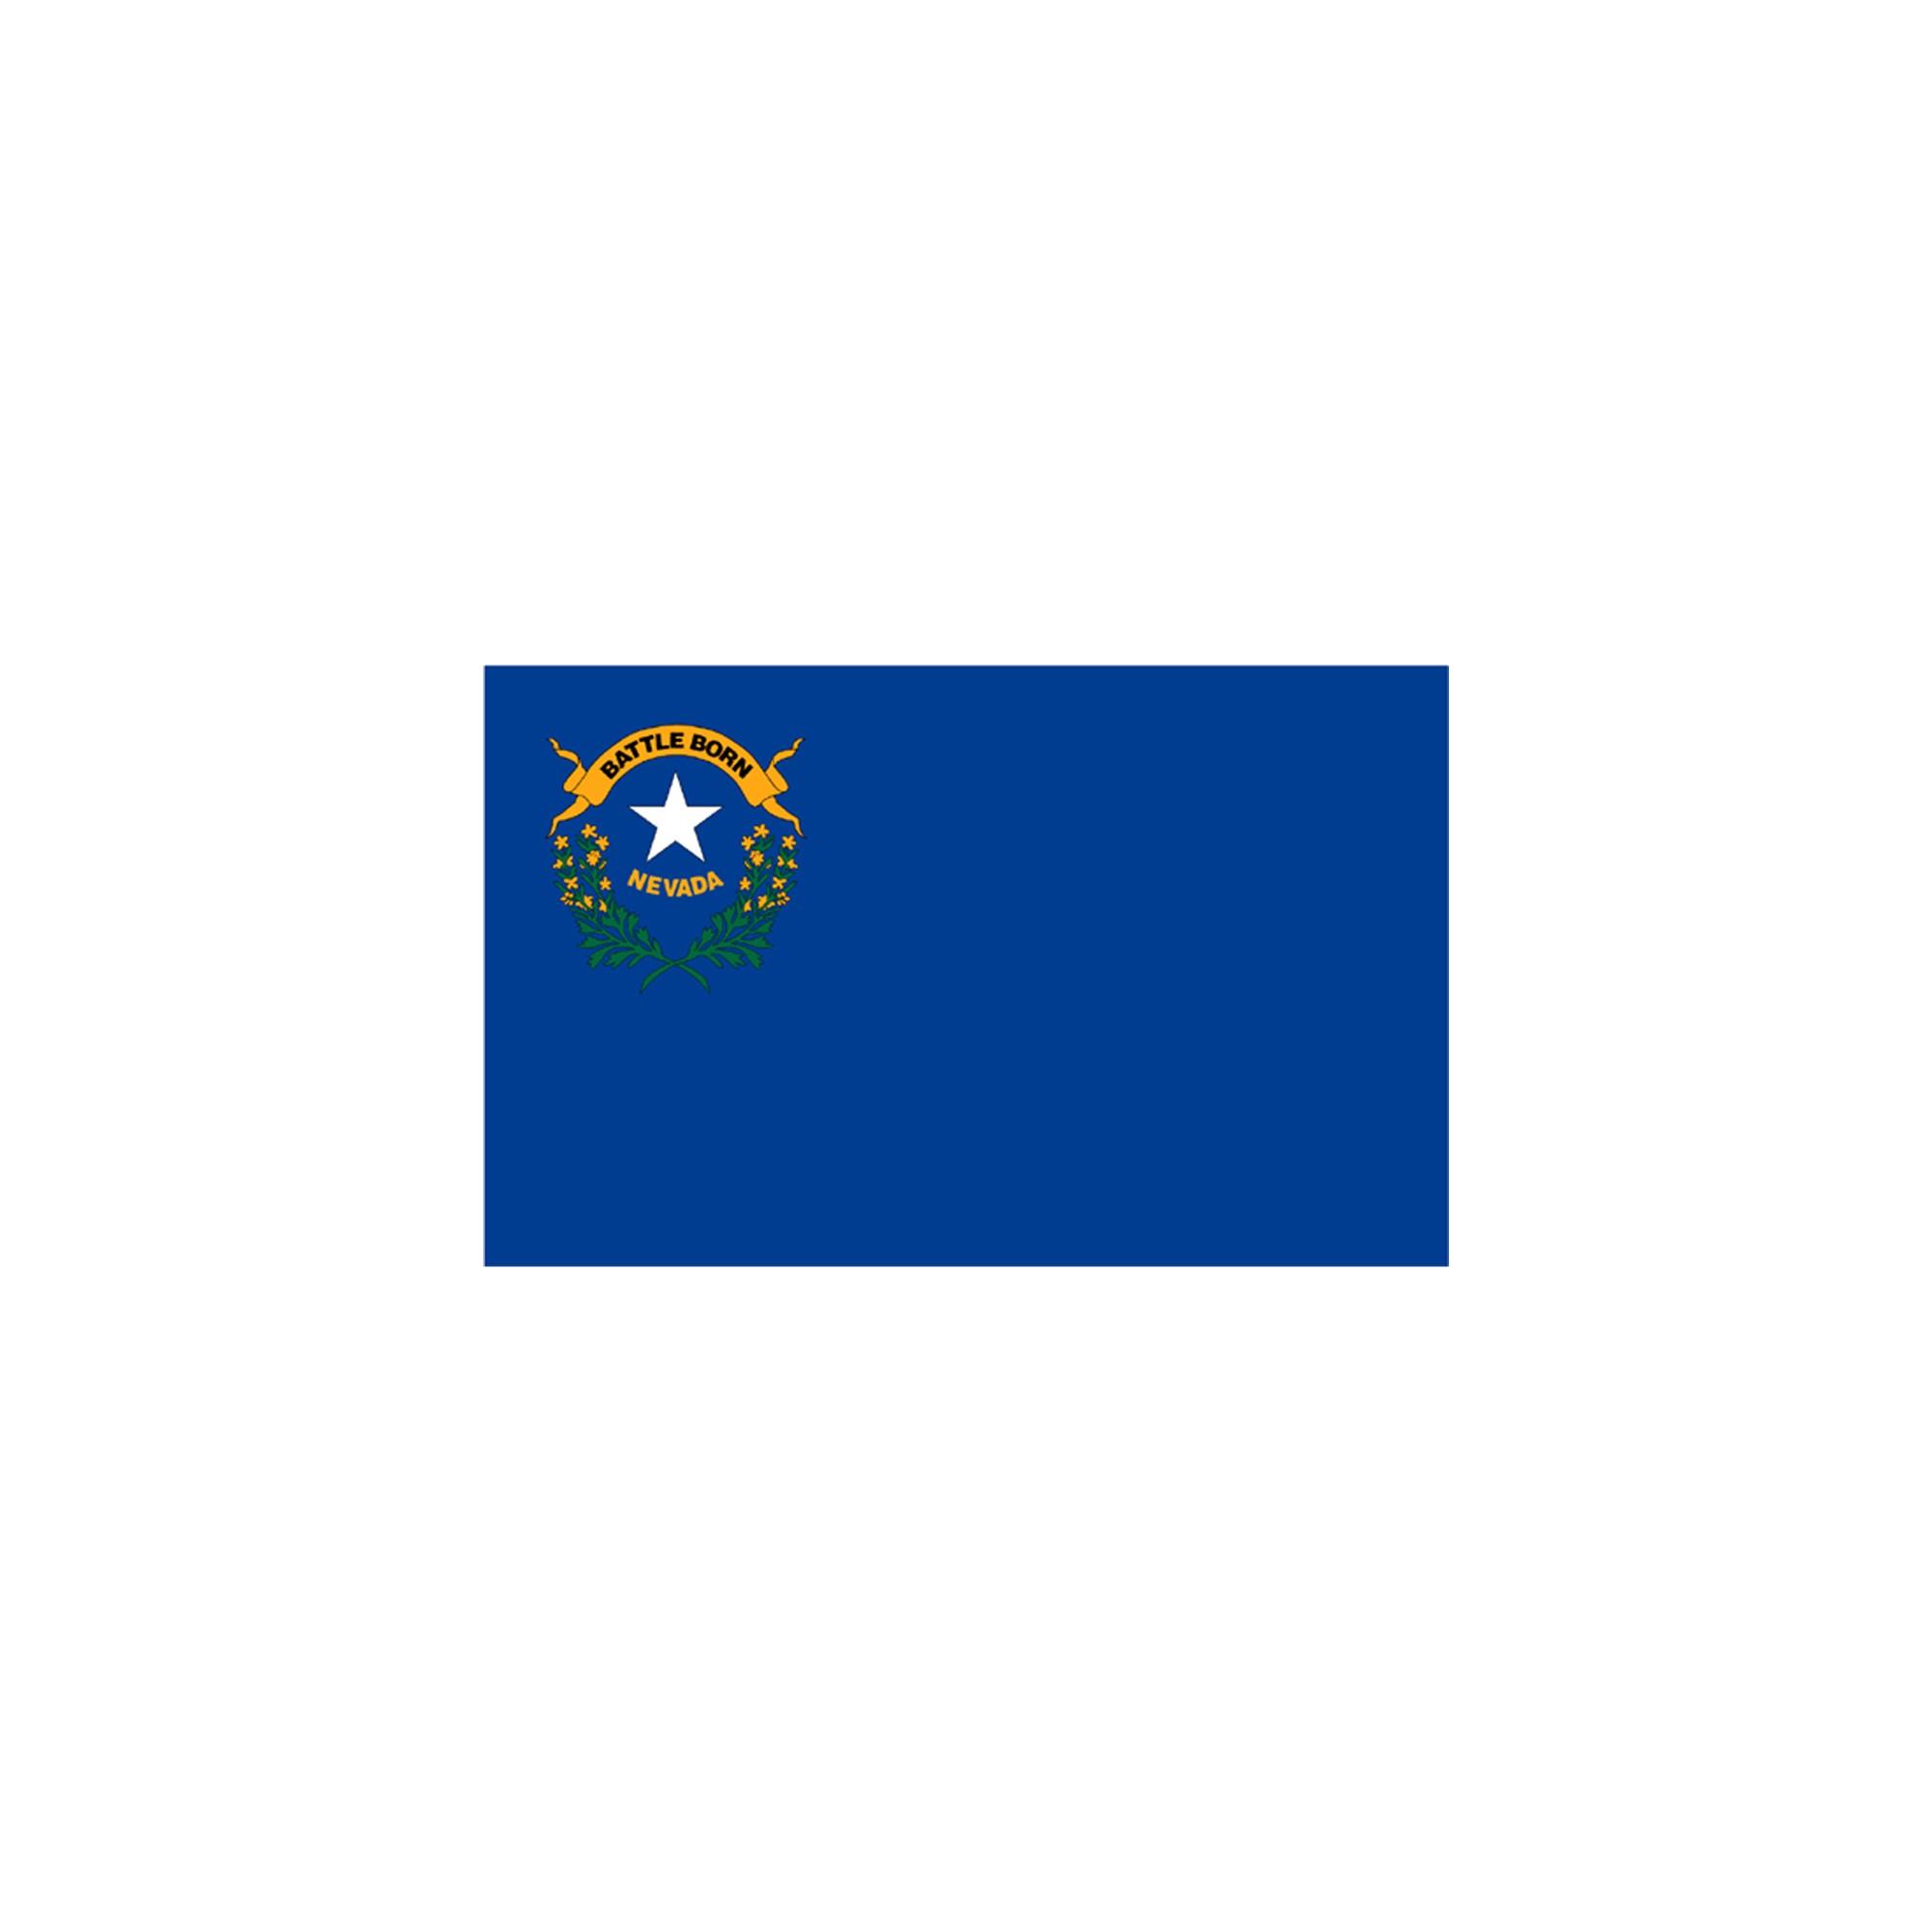 Halloween Nevada State Flag - 4' x 6'